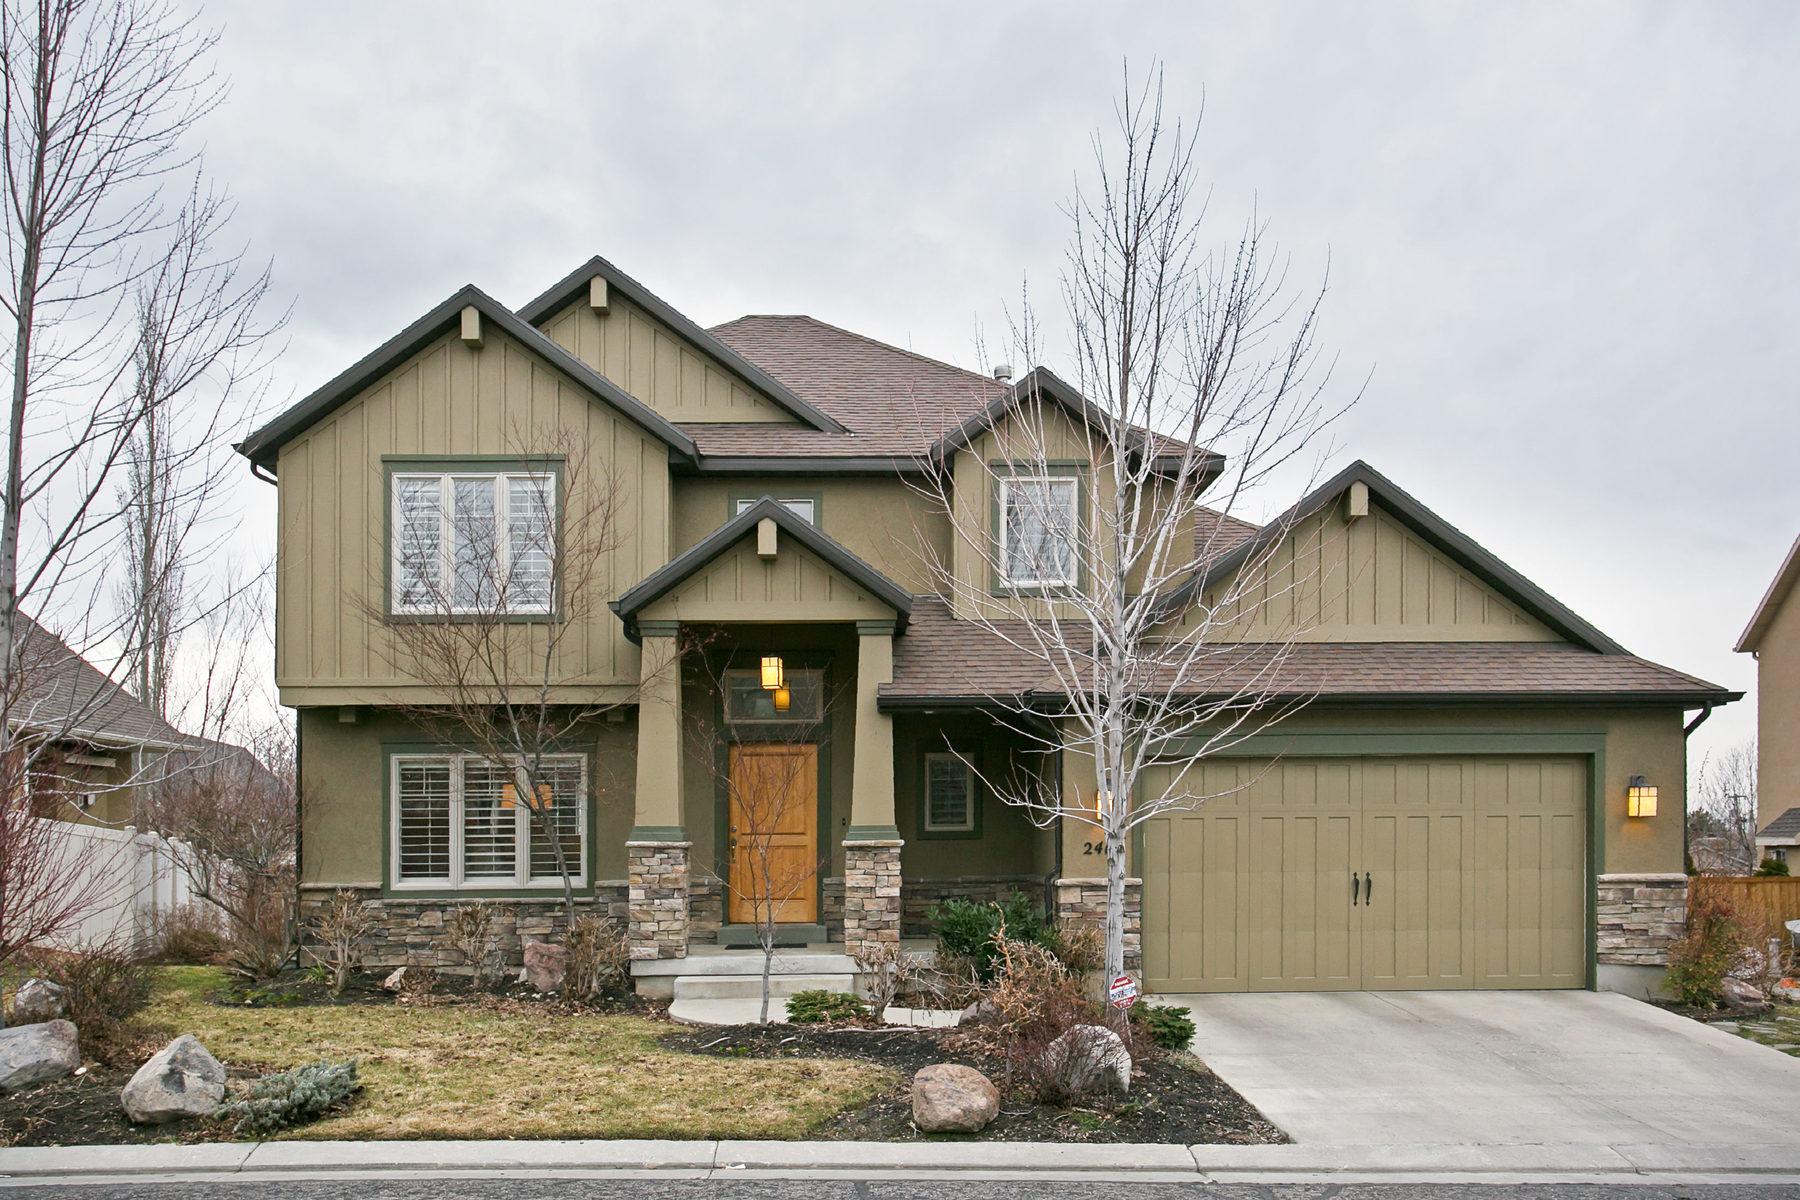 Einfamilienhaus für Verkauf beim Beautiful East Millcreek Two-Story 2418 E Woodwillow Cir Salt Lake City, Utah, 84109 Vereinigte Staaten